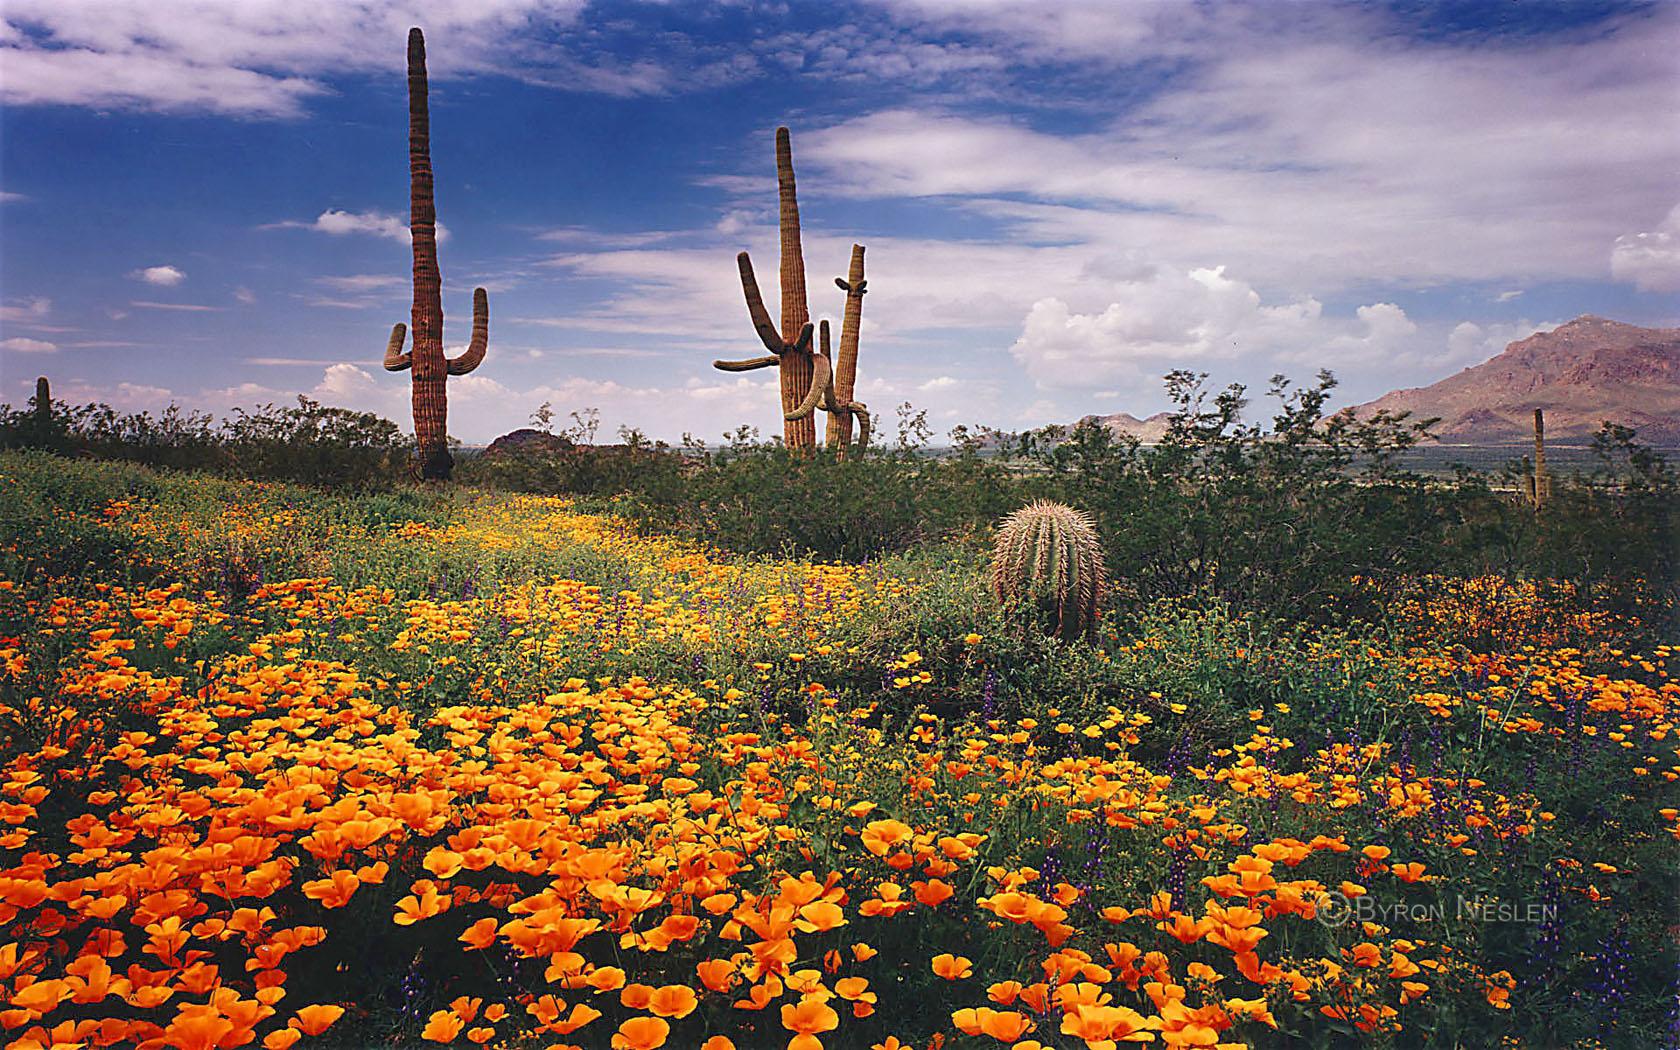 Sonoran Desert Wildflowers 1680x1050